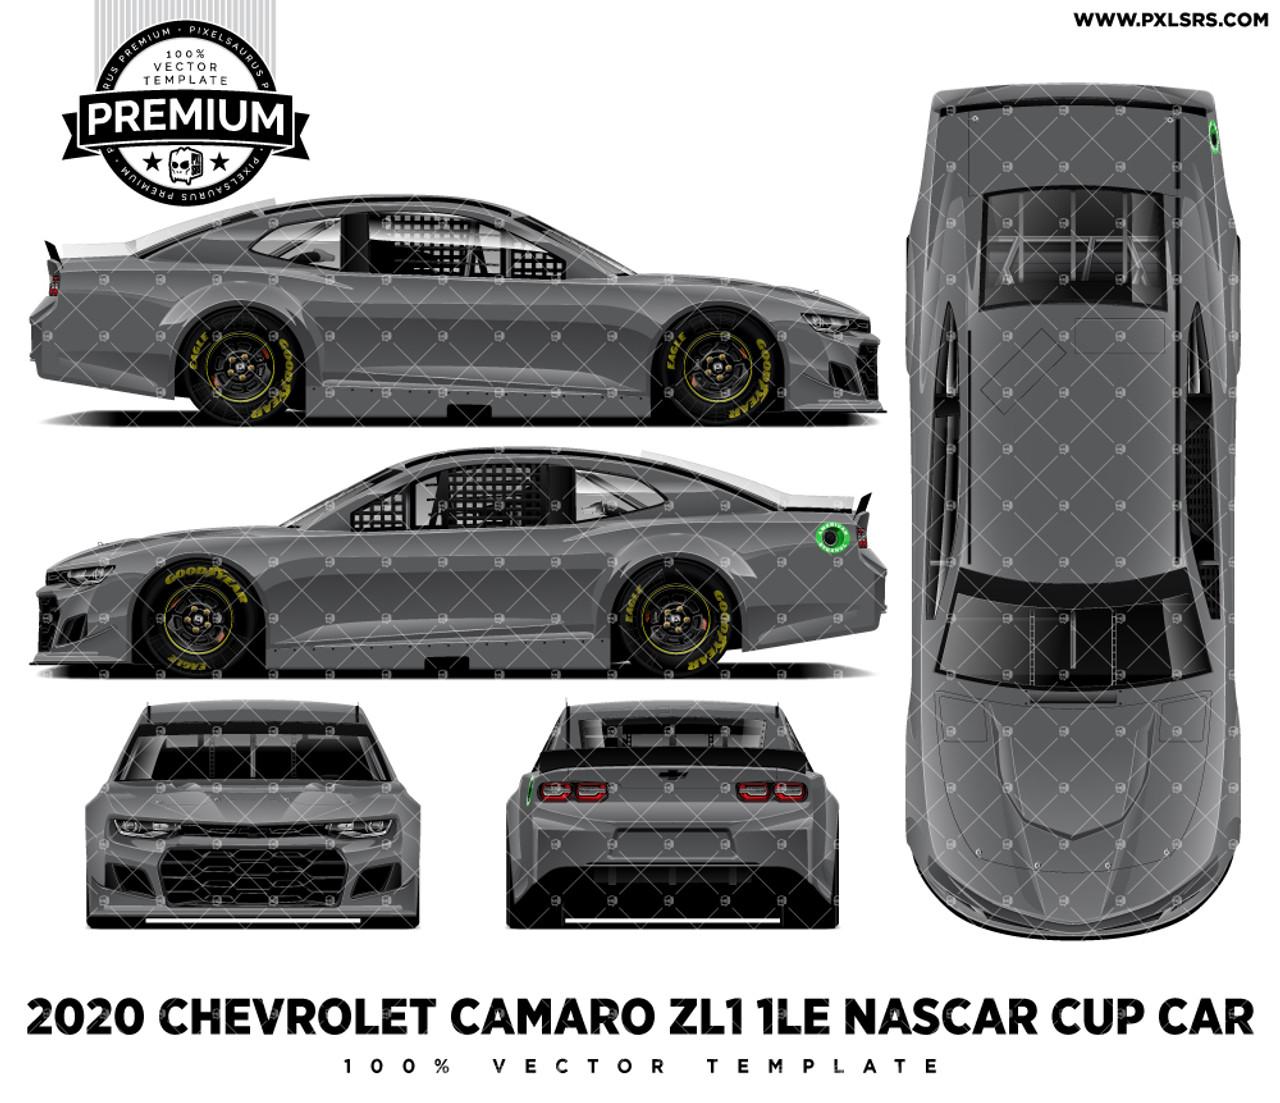 2020 Chevrolet Camaro Zl1 1le Nascar Full Premium Vector Template Pixelsaurus